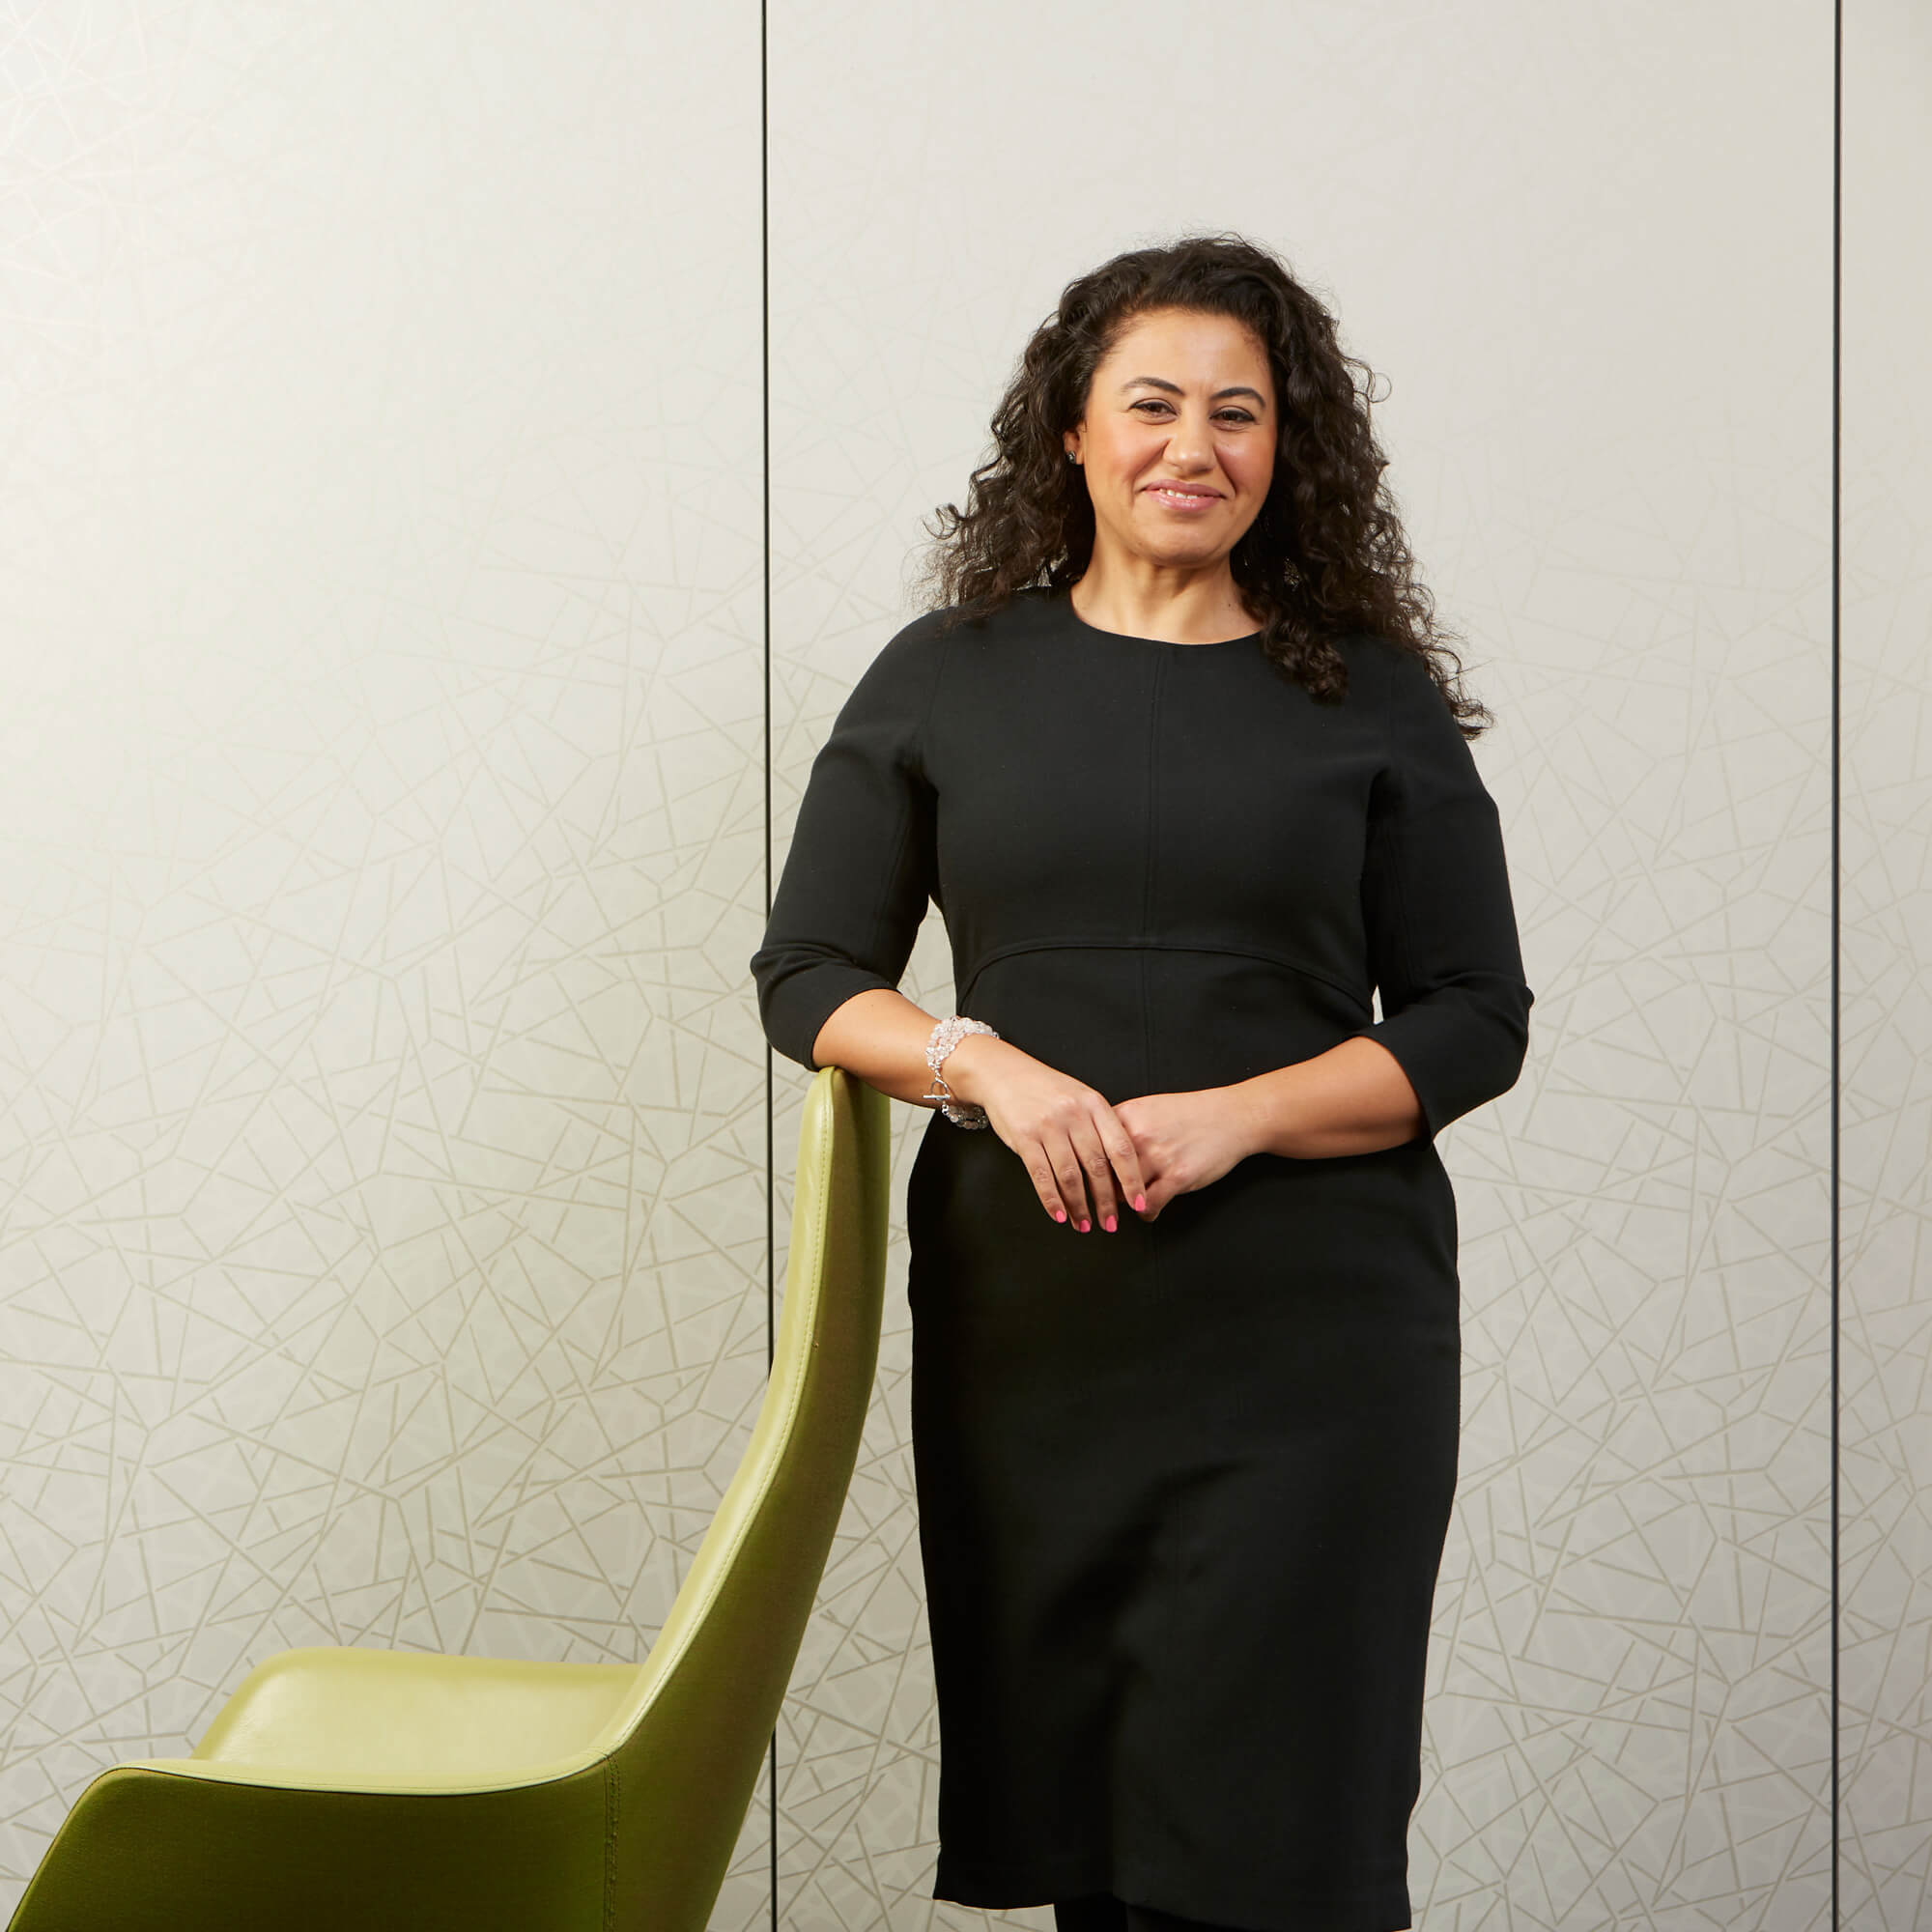 Nada Jarnaz, head of banking at Howard Kennedy law firm